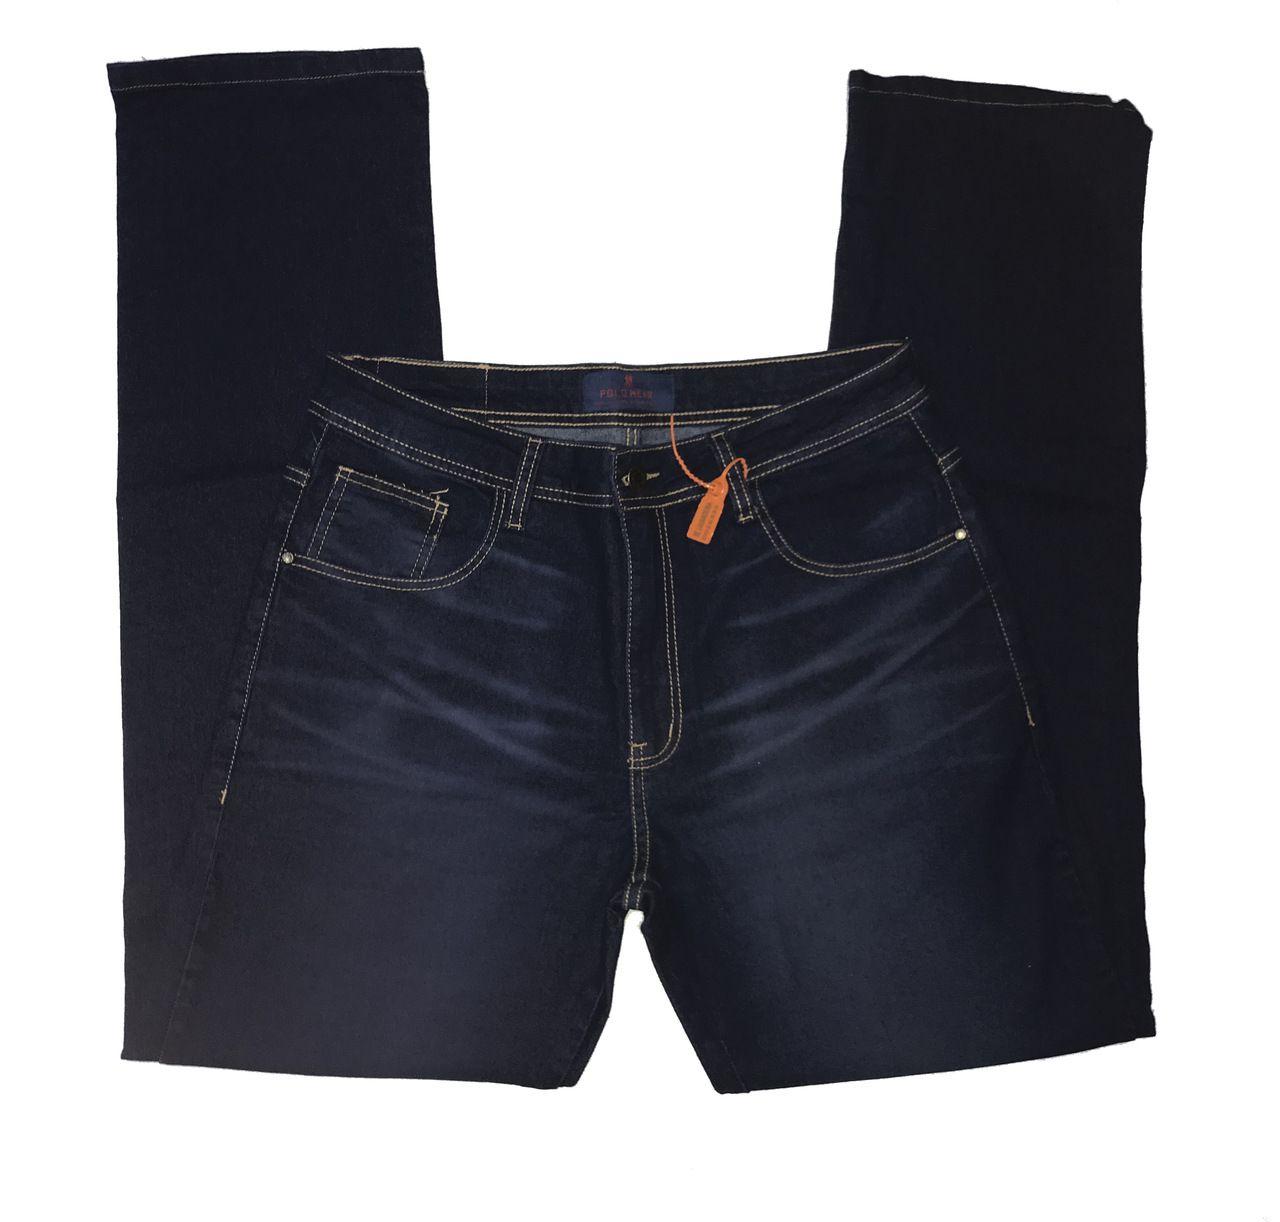 Calça Jeans Masculina Strech  - Boutique Mangalarga